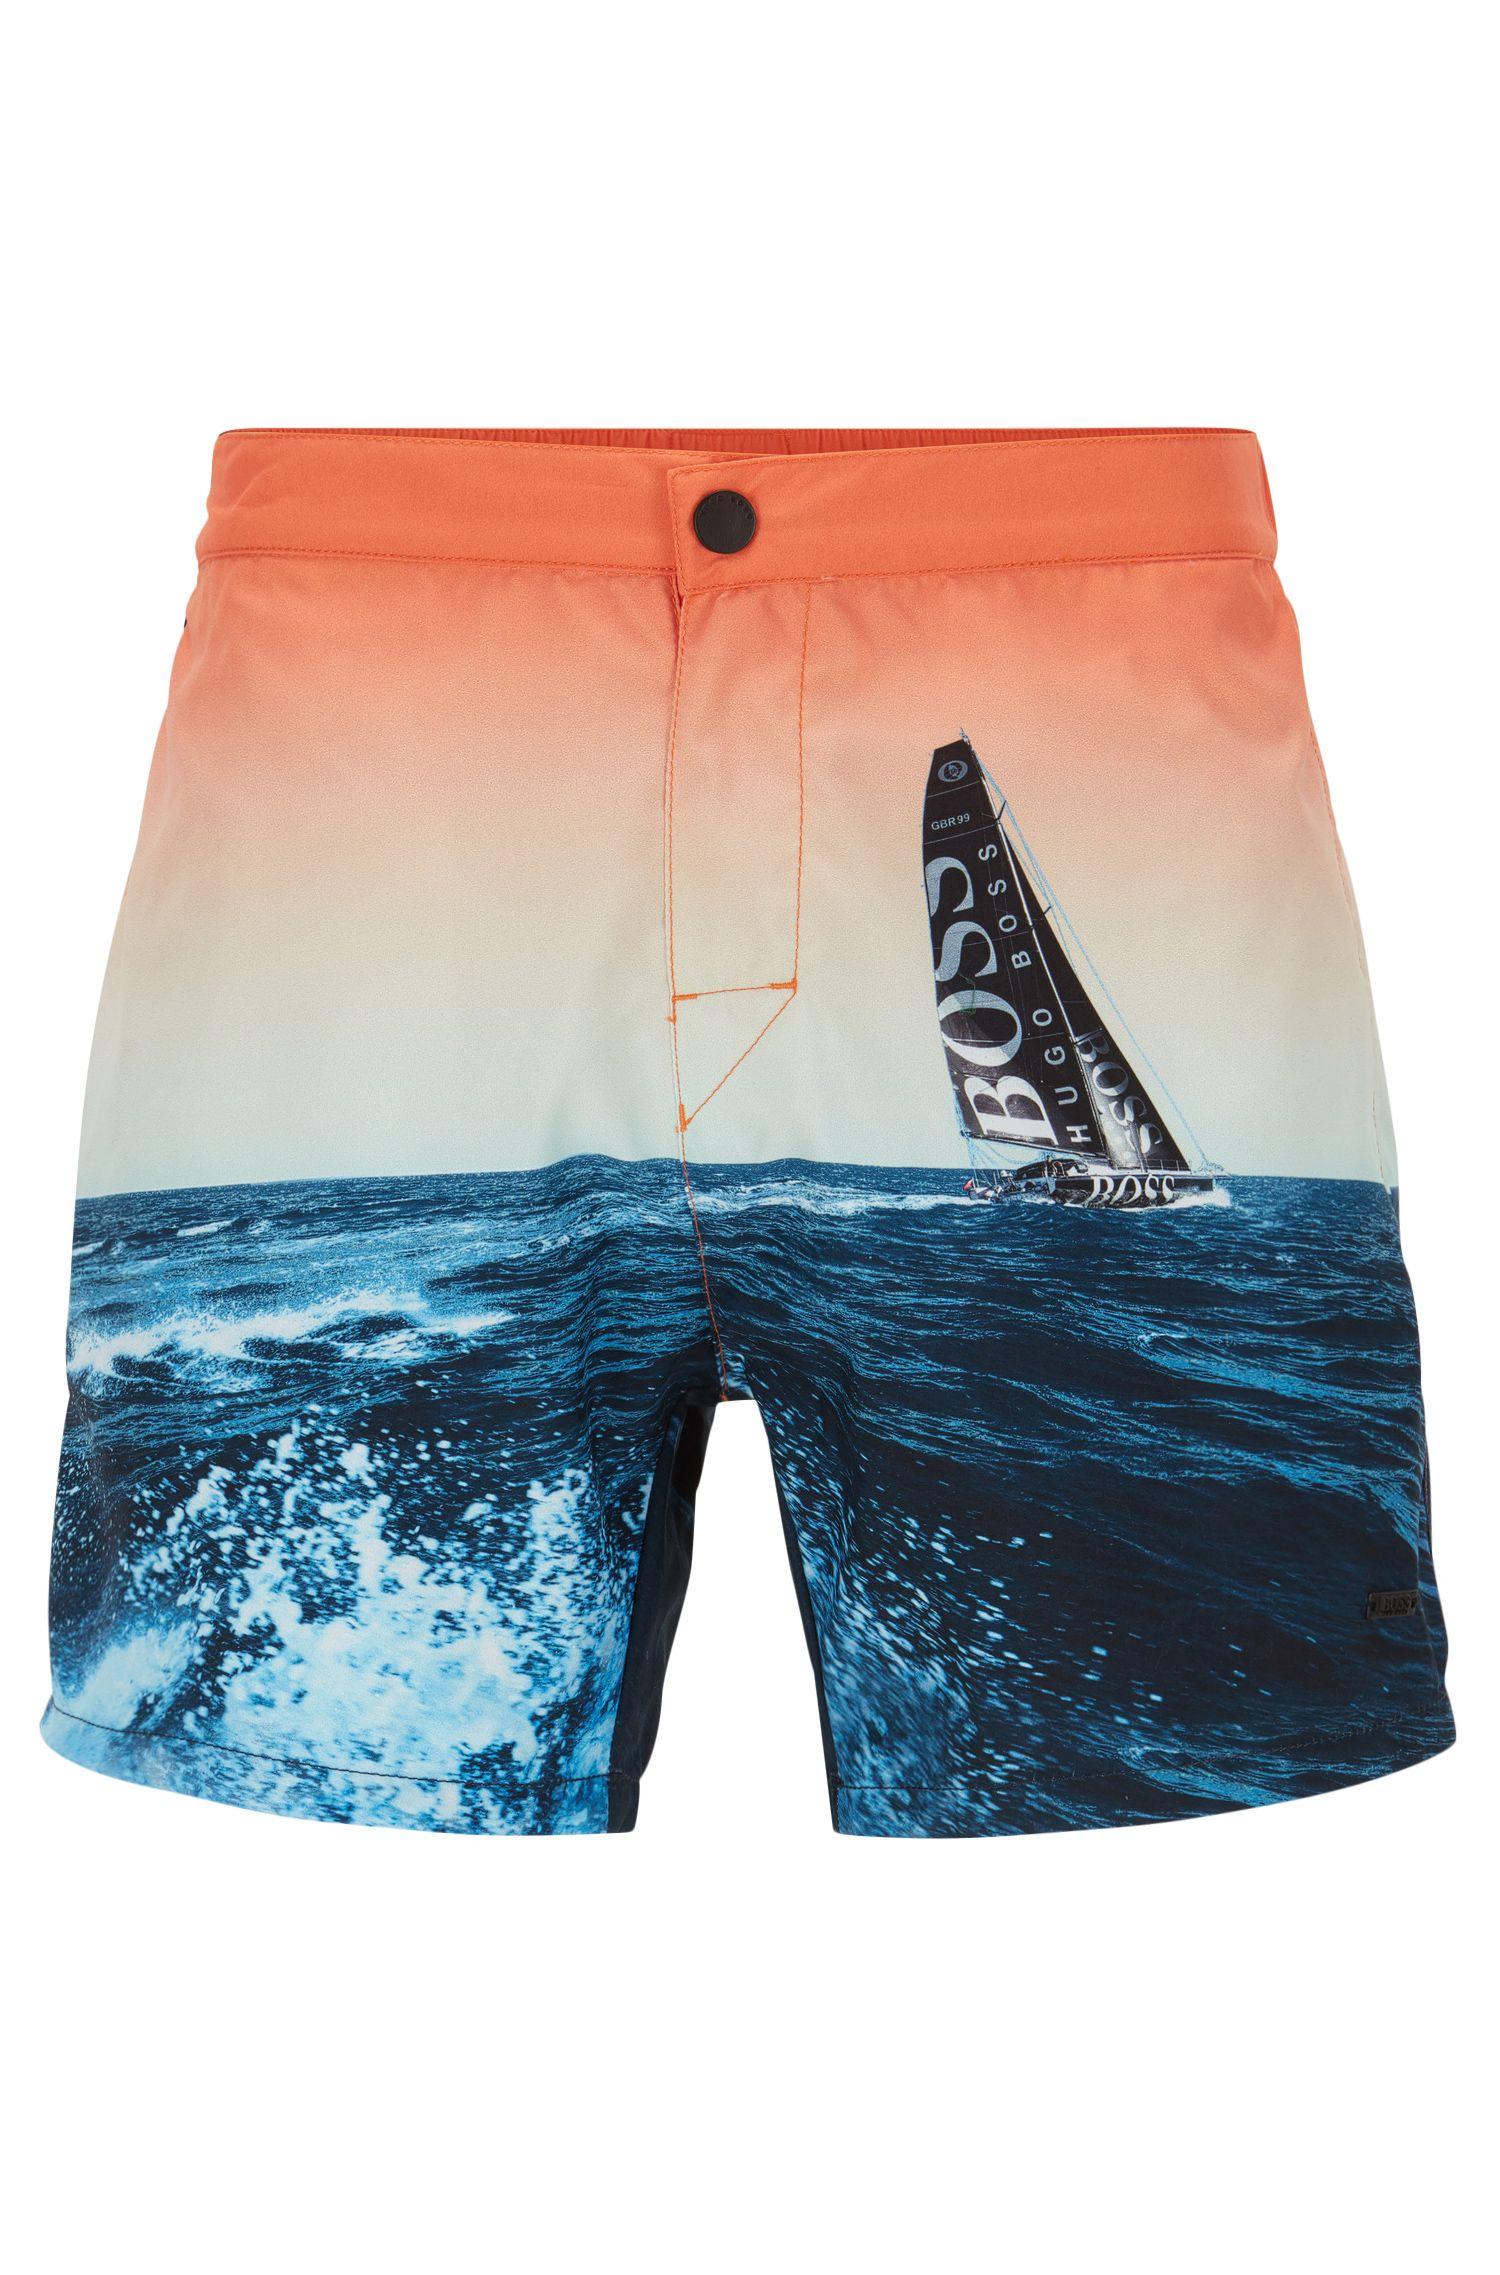 Quick Dry Racing Swim Trunks | Blackfish, Open Blue